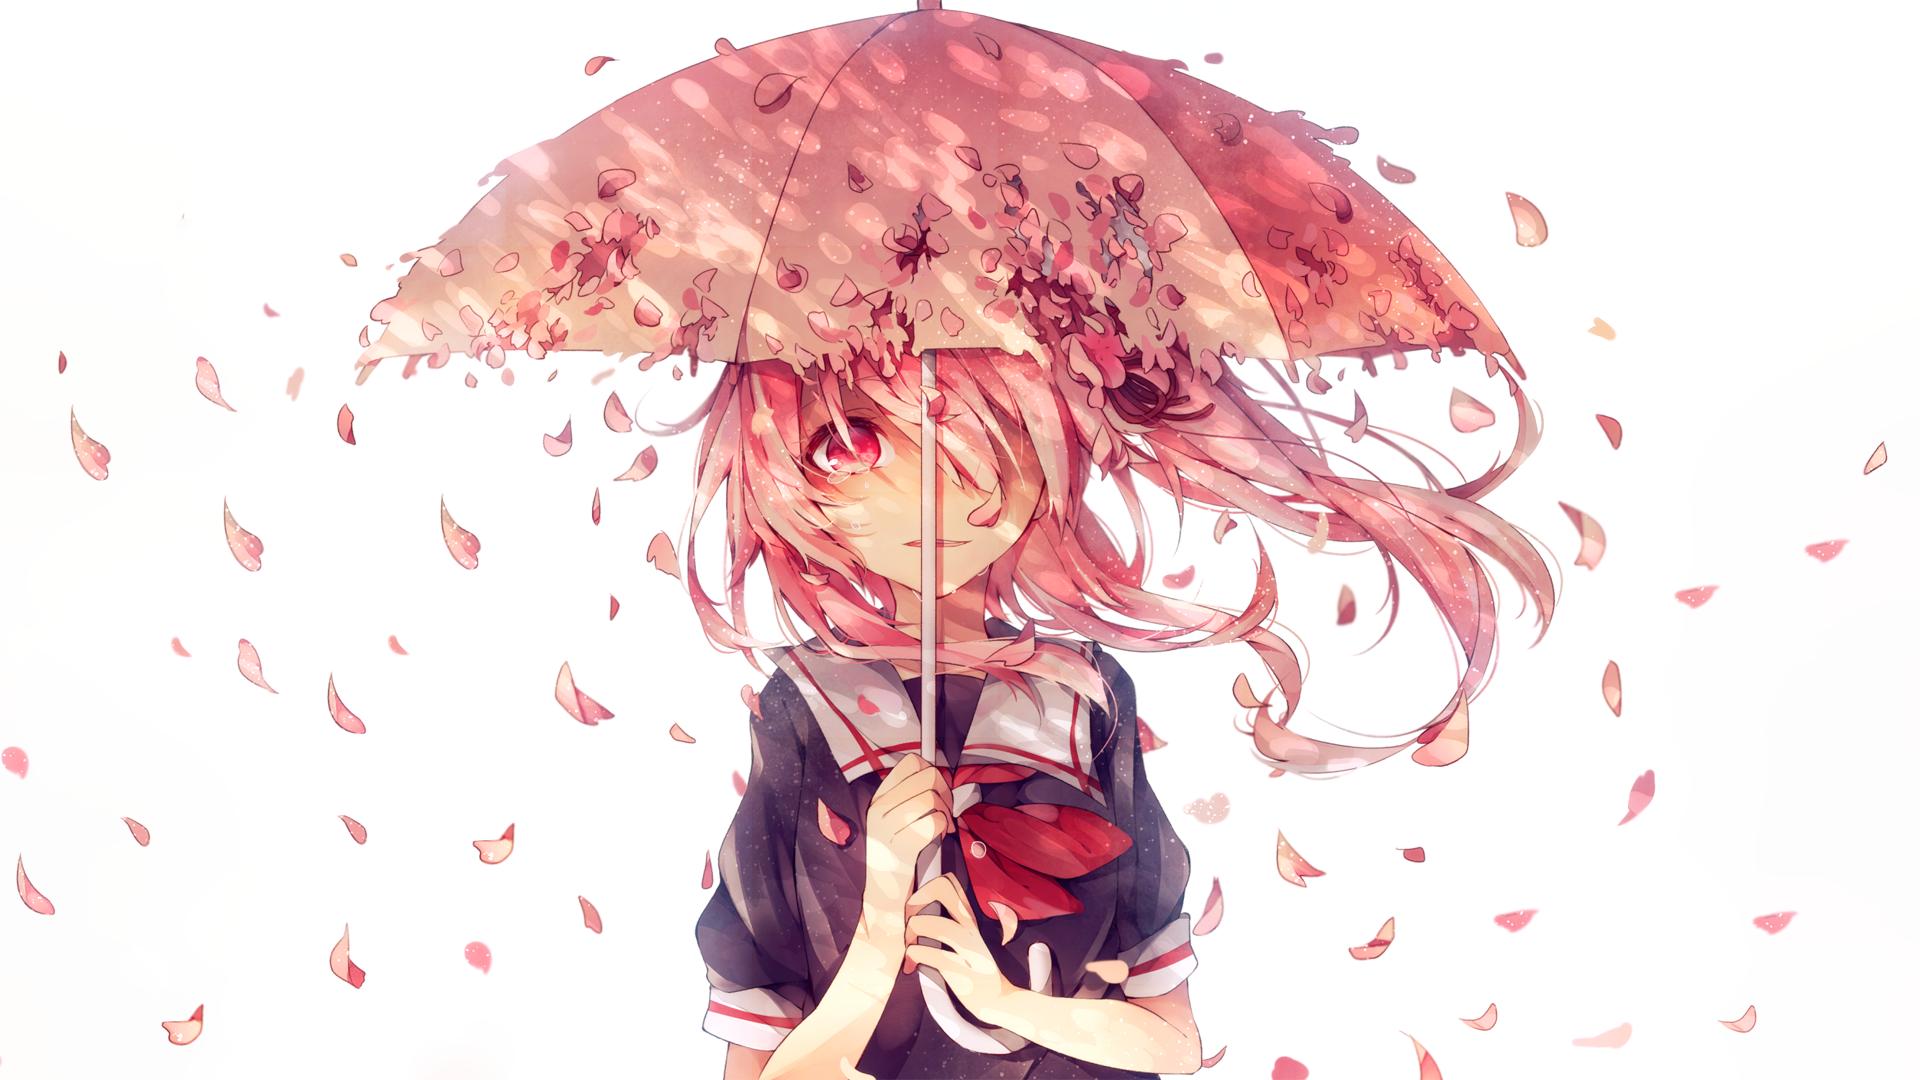 Hintergrundbilder : Zeichnung, Illustration, Anime, Manga, Karikatur ...